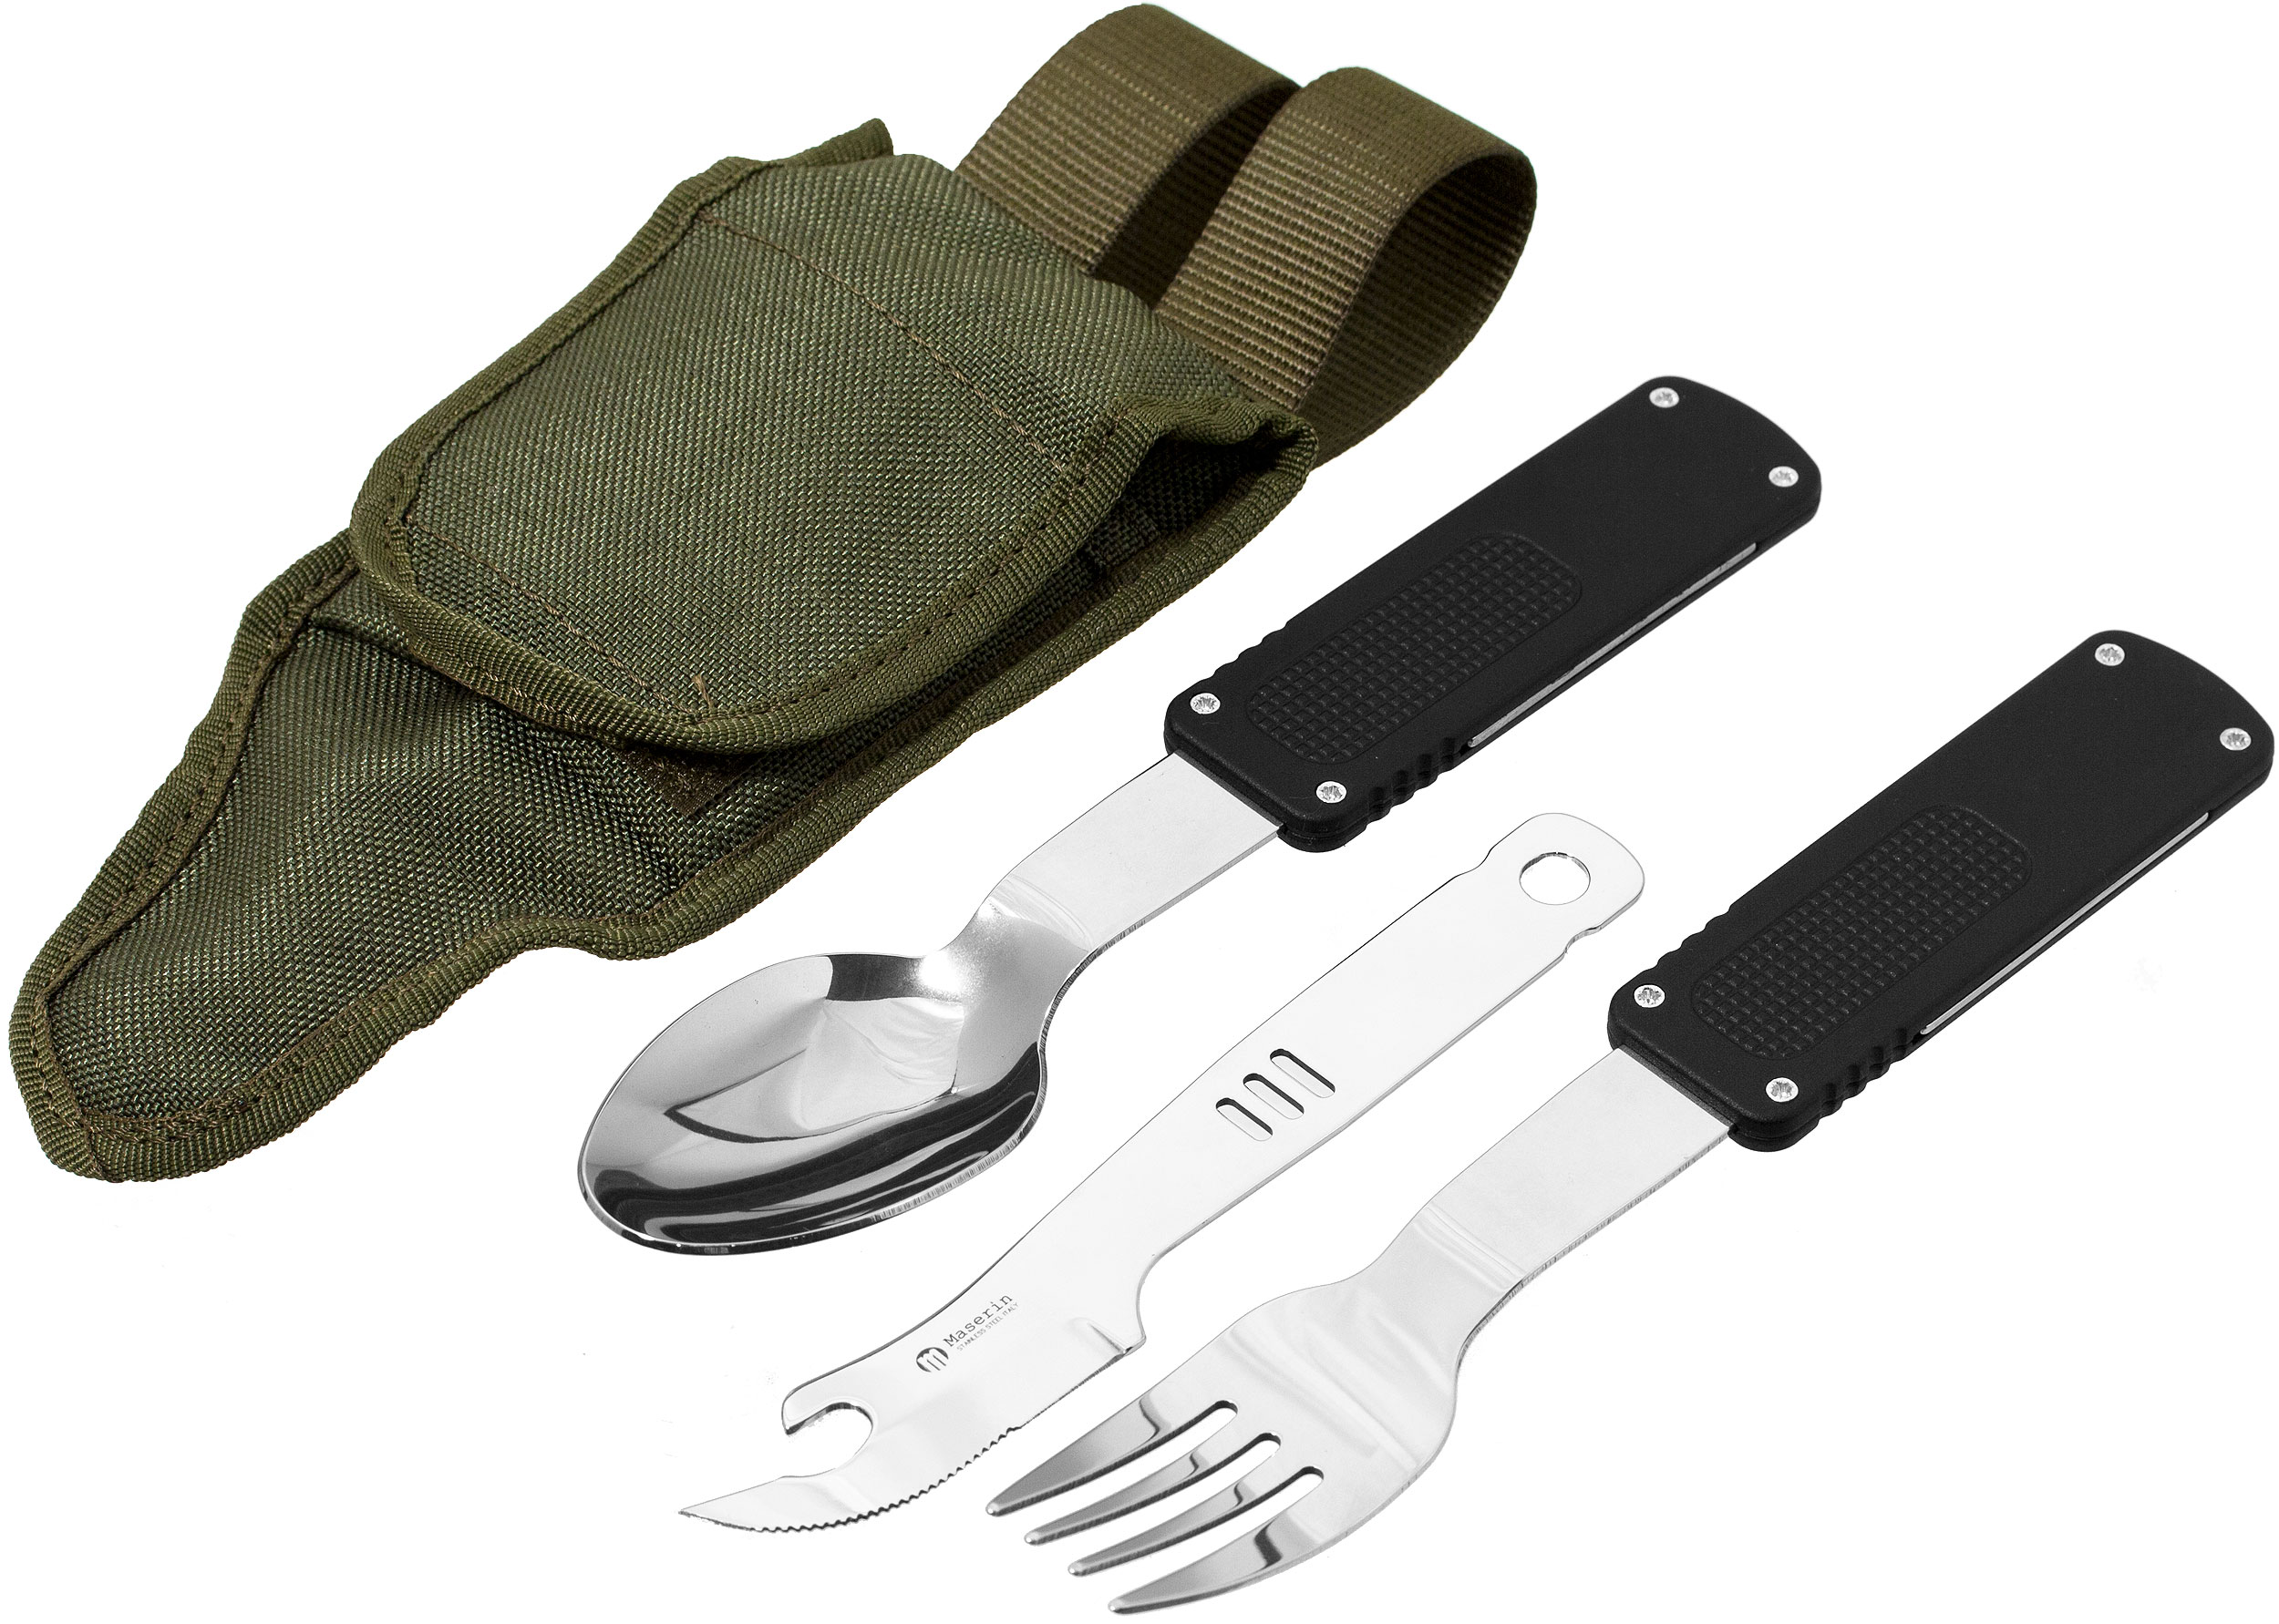 Maserin 946 Travel Cutlery Set